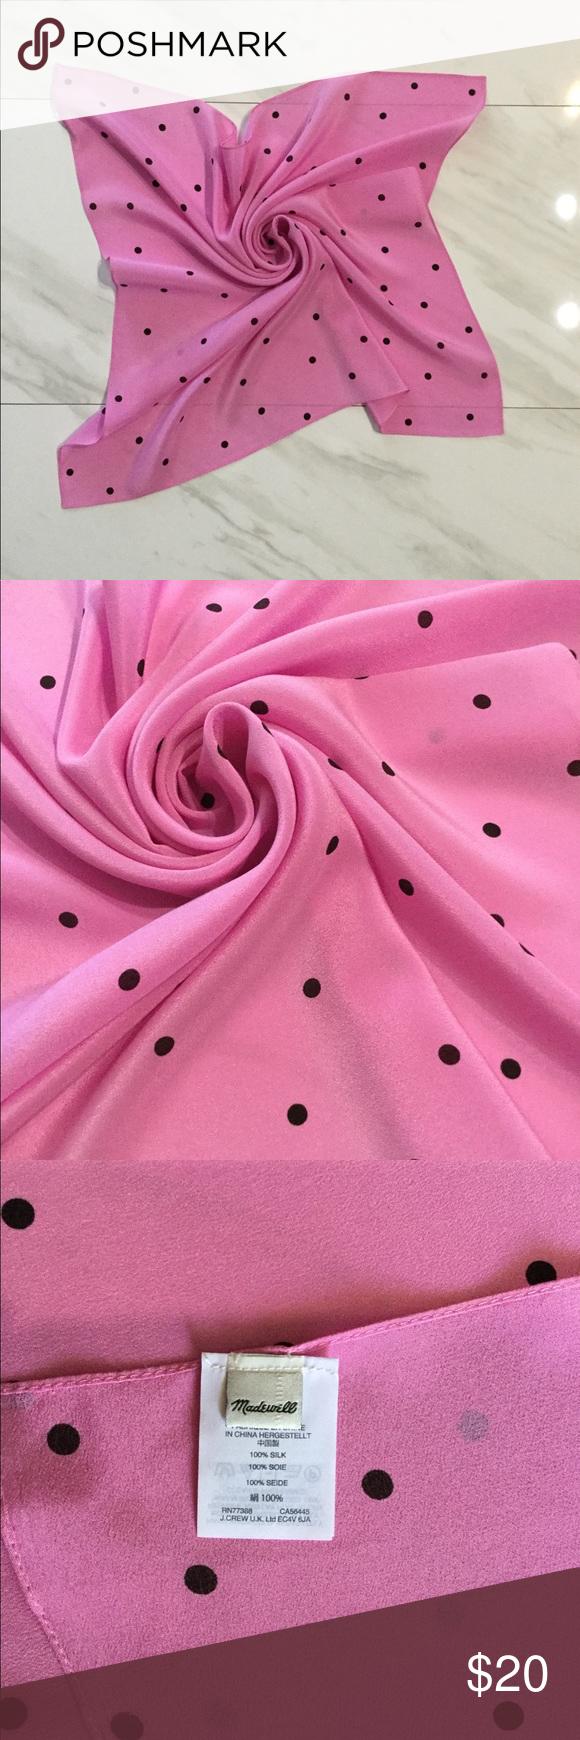 Madewell Silk Scarf Nwot Pretty Scarves Scarf Scarf Accessory